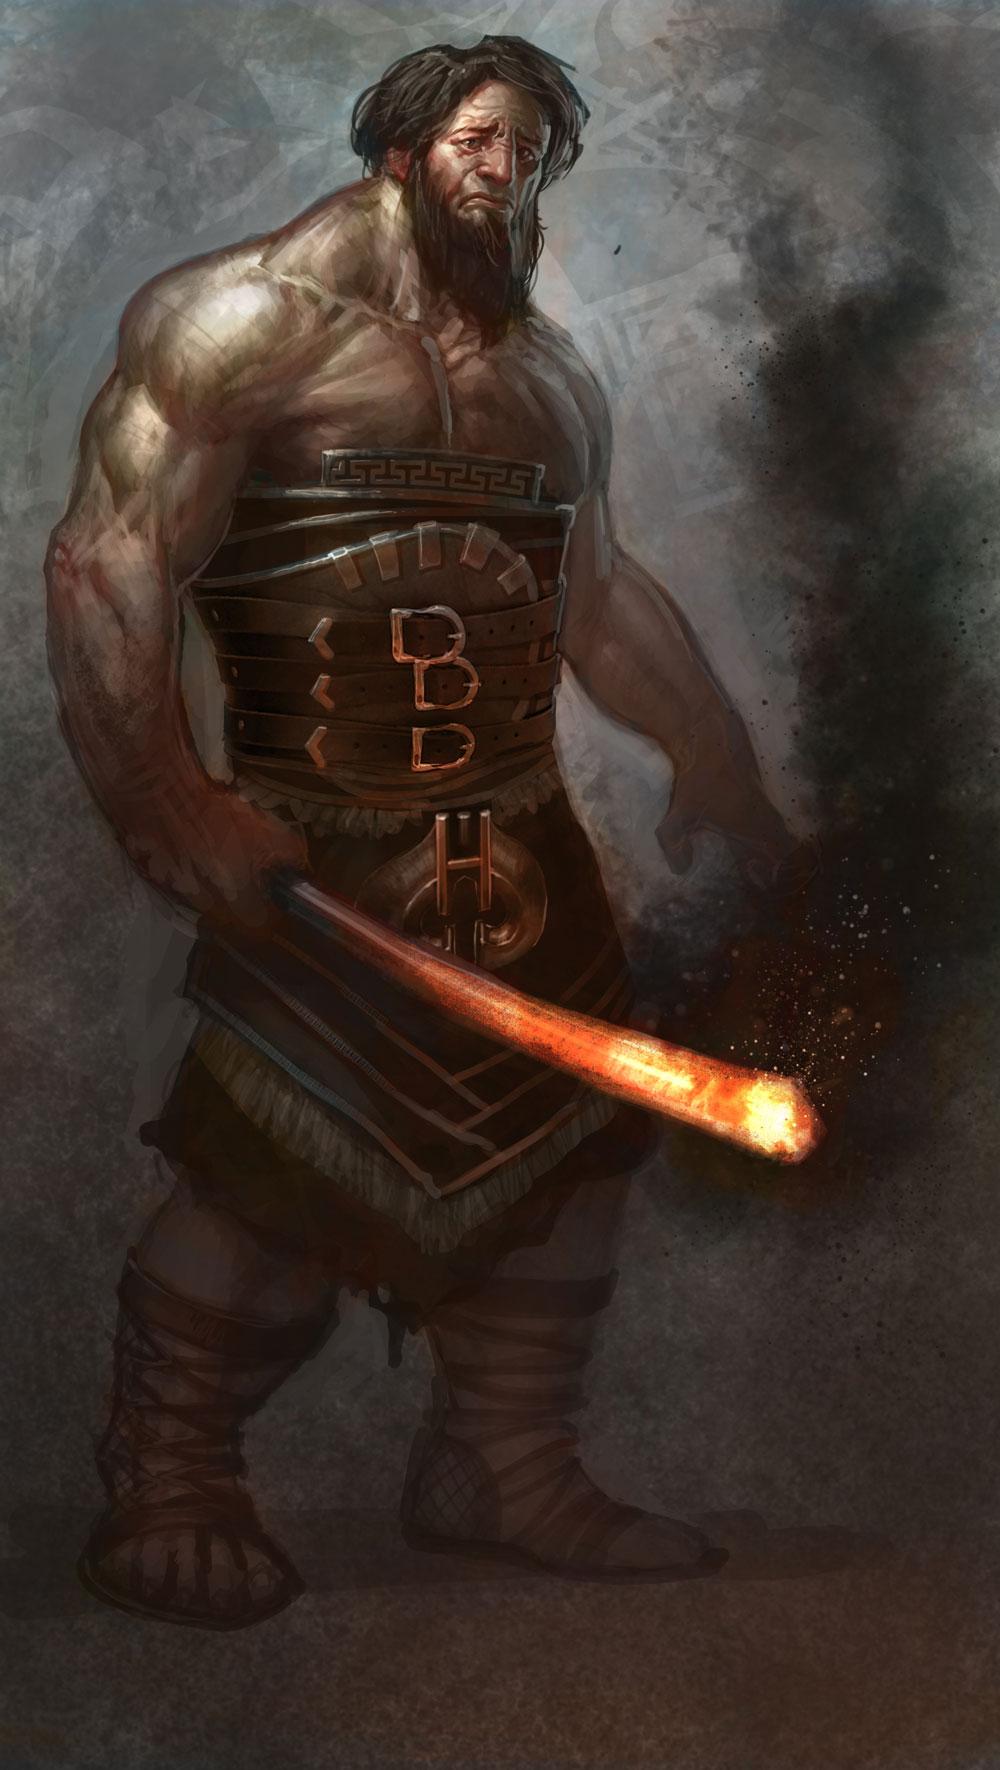 Hephaestus | Villains Wiki | FANDOM powered by Wikia